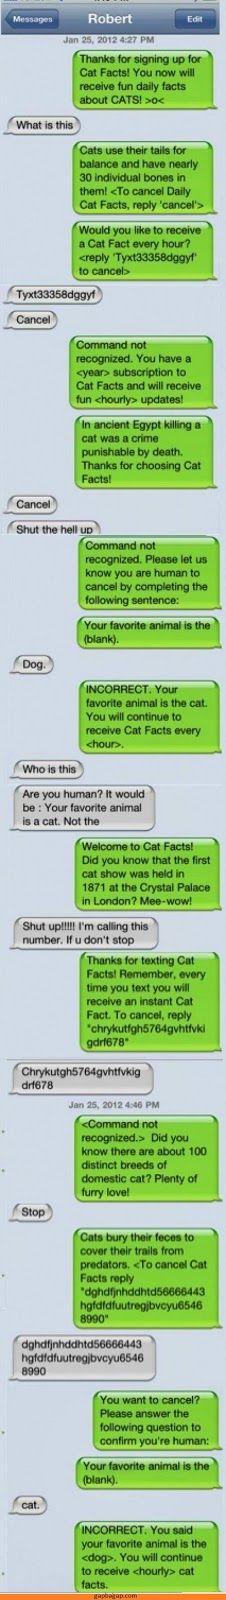 Hilarious Text About Man vs. Cats